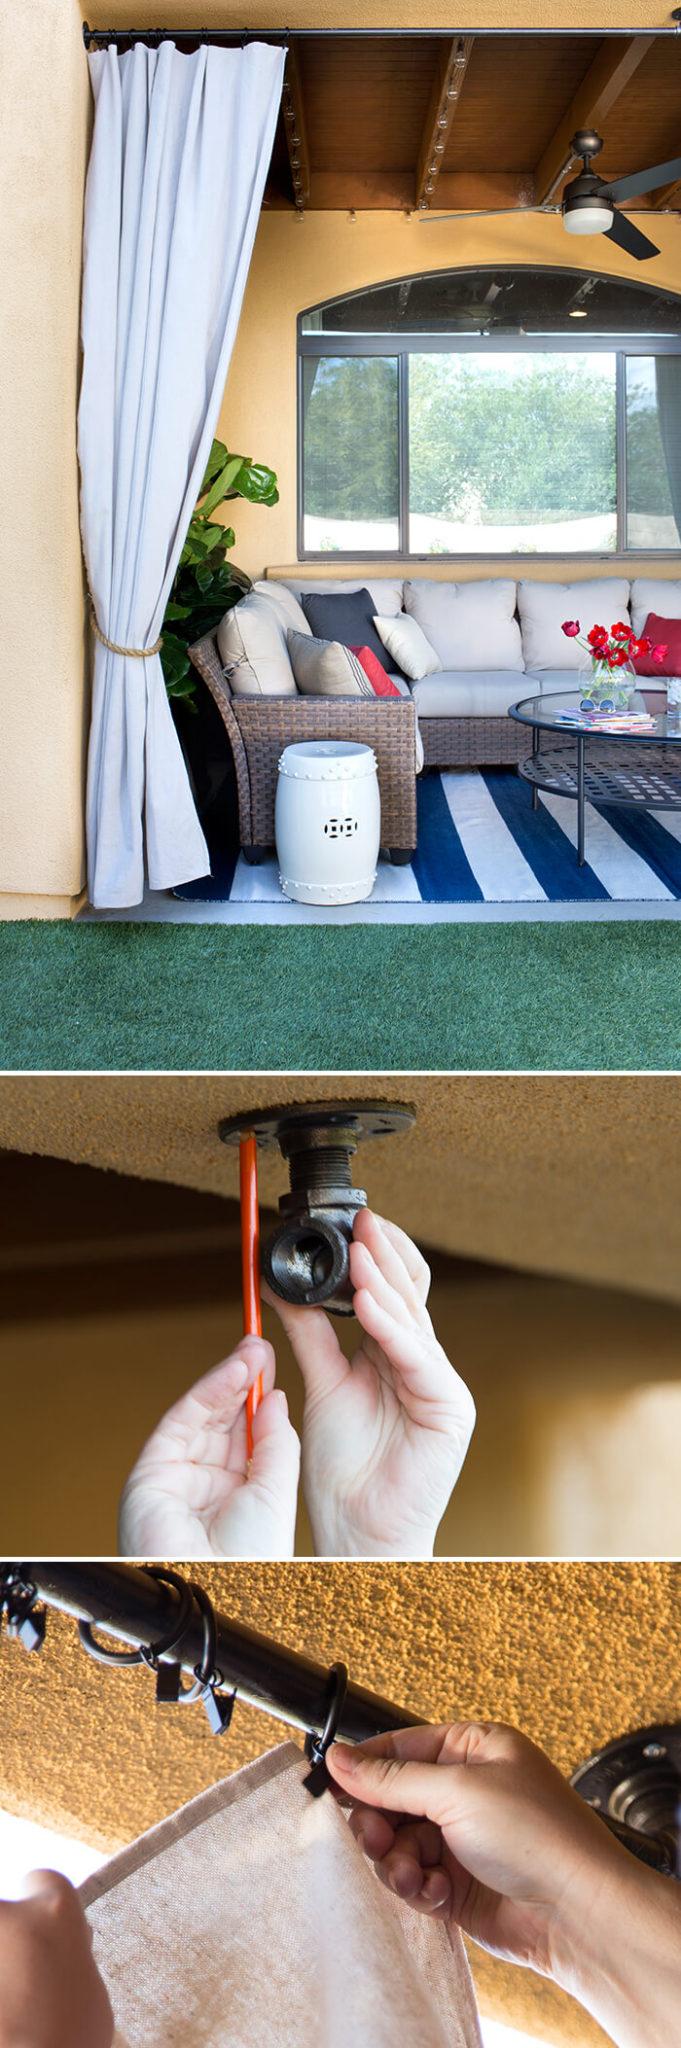 DIY ιδέες σκίασης21